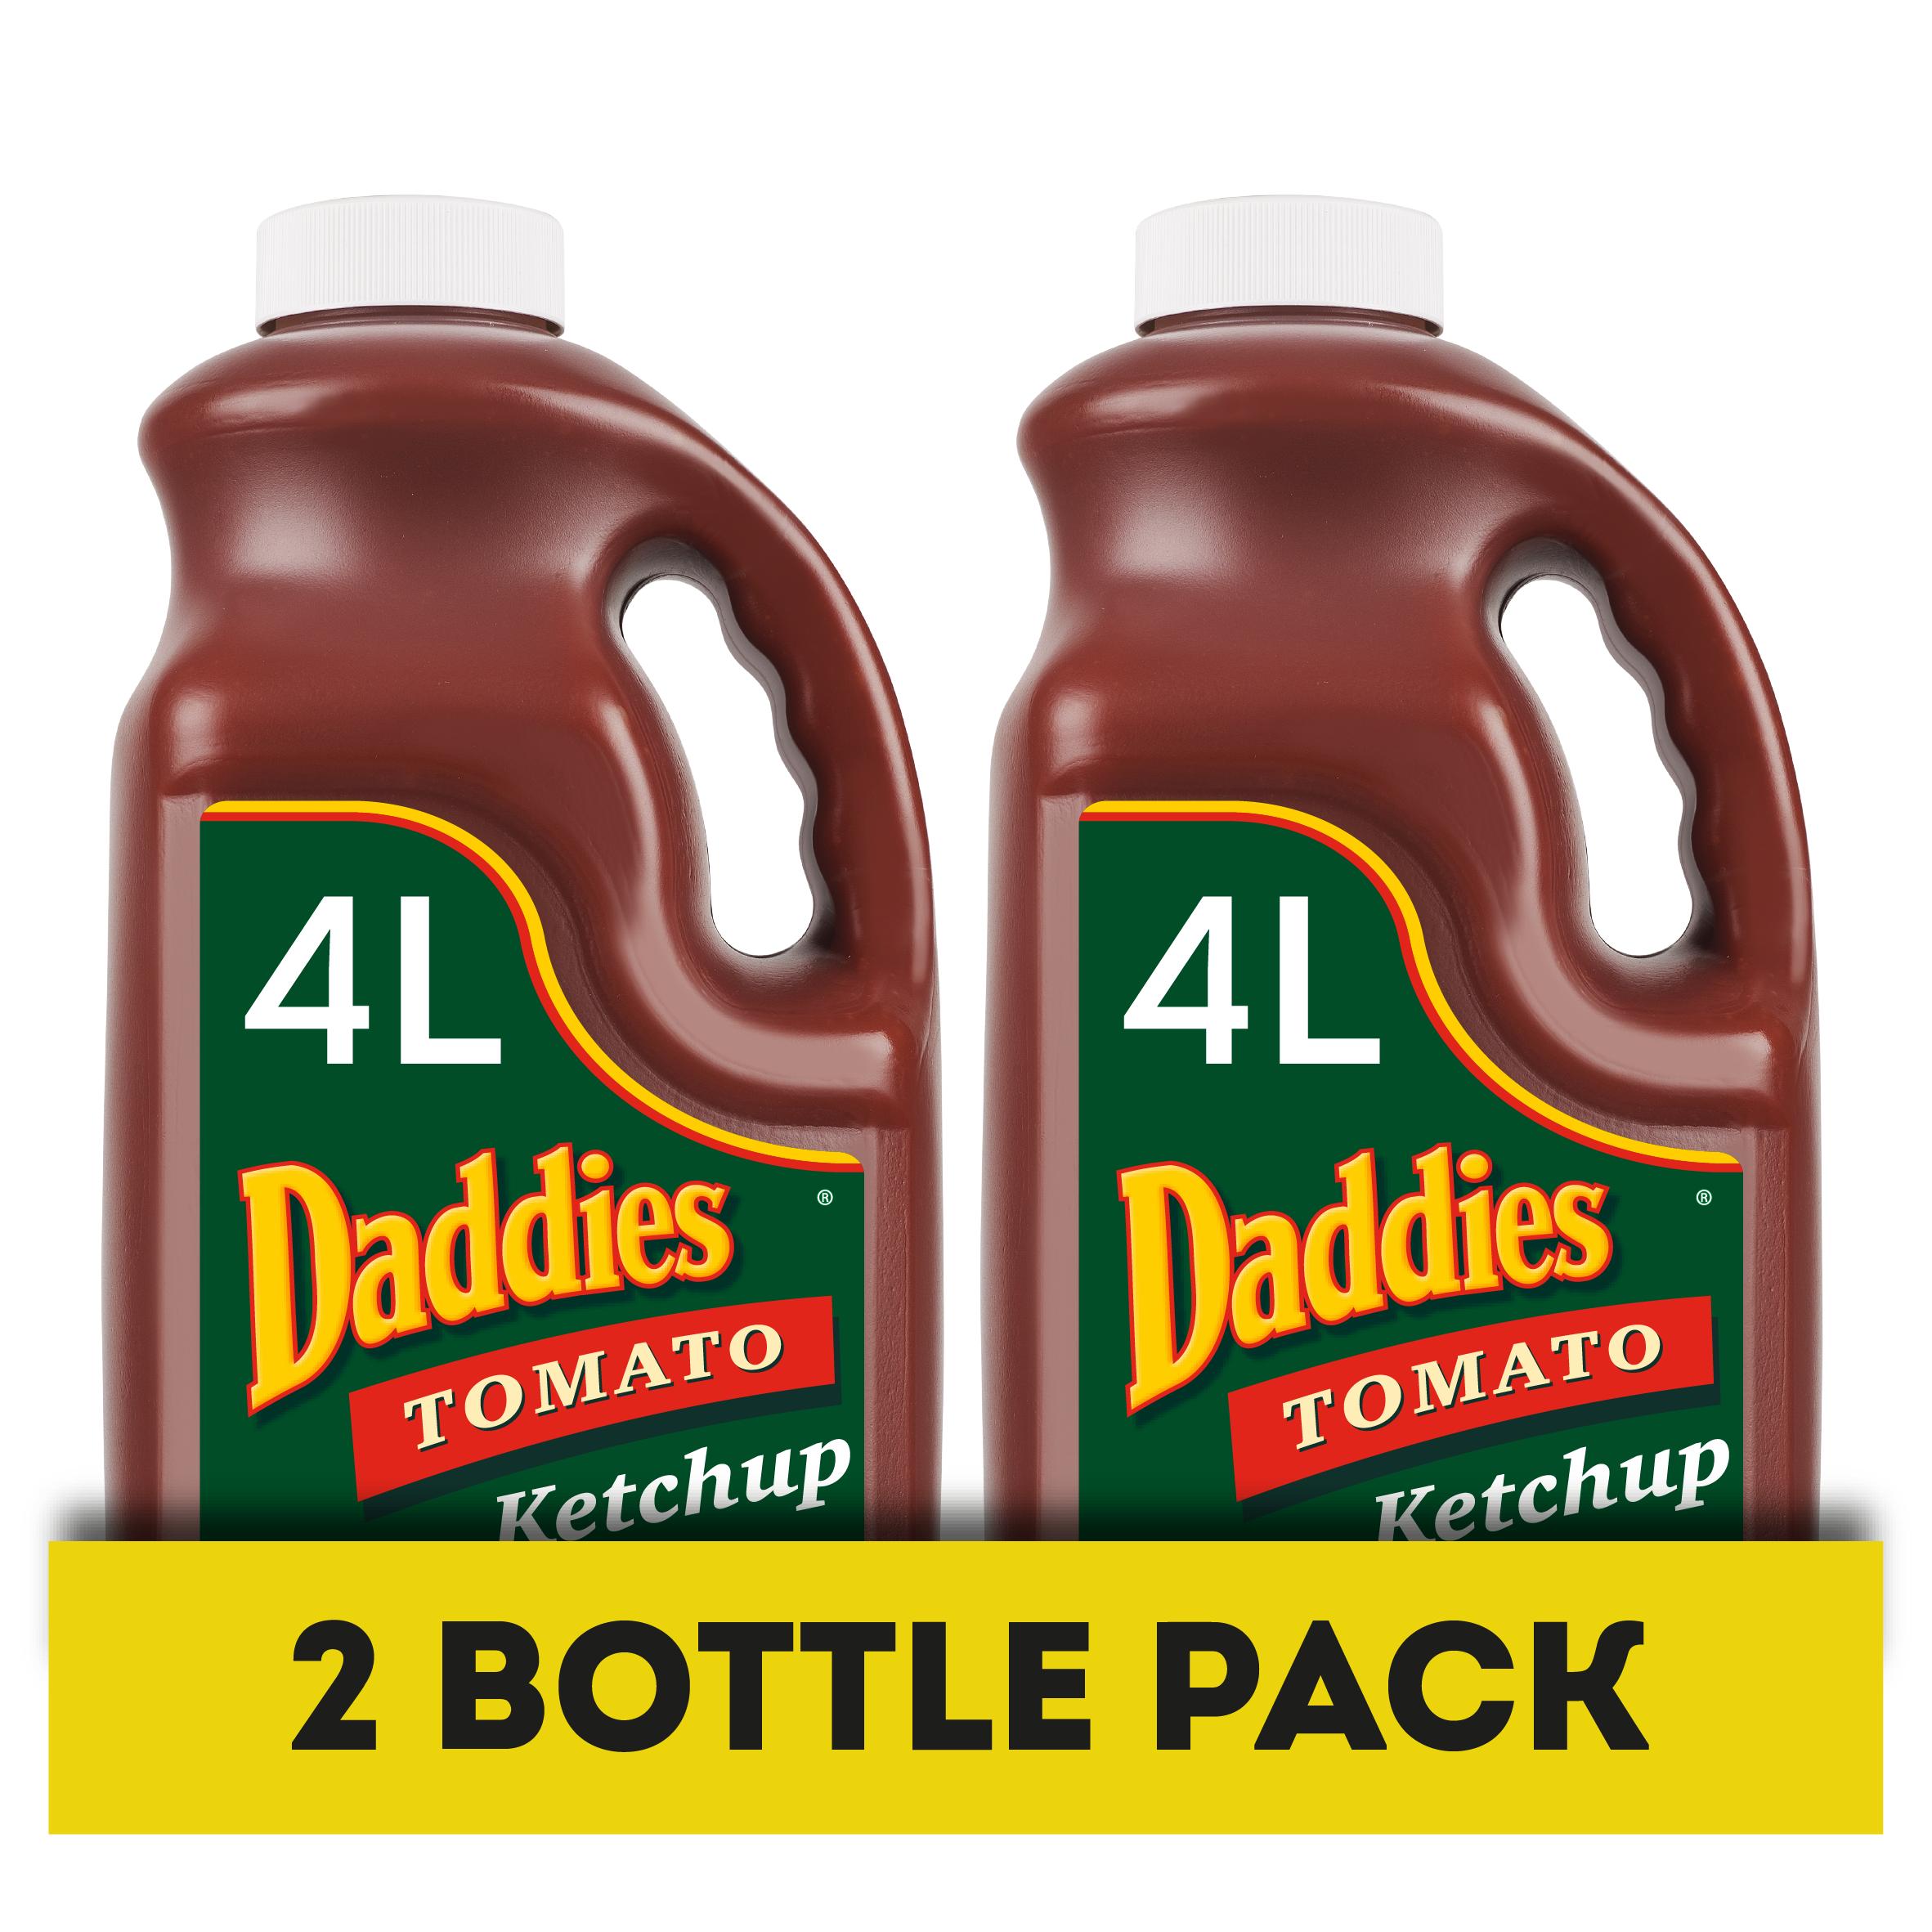 Daddies Tomato Ketchup 4L Handle Jars